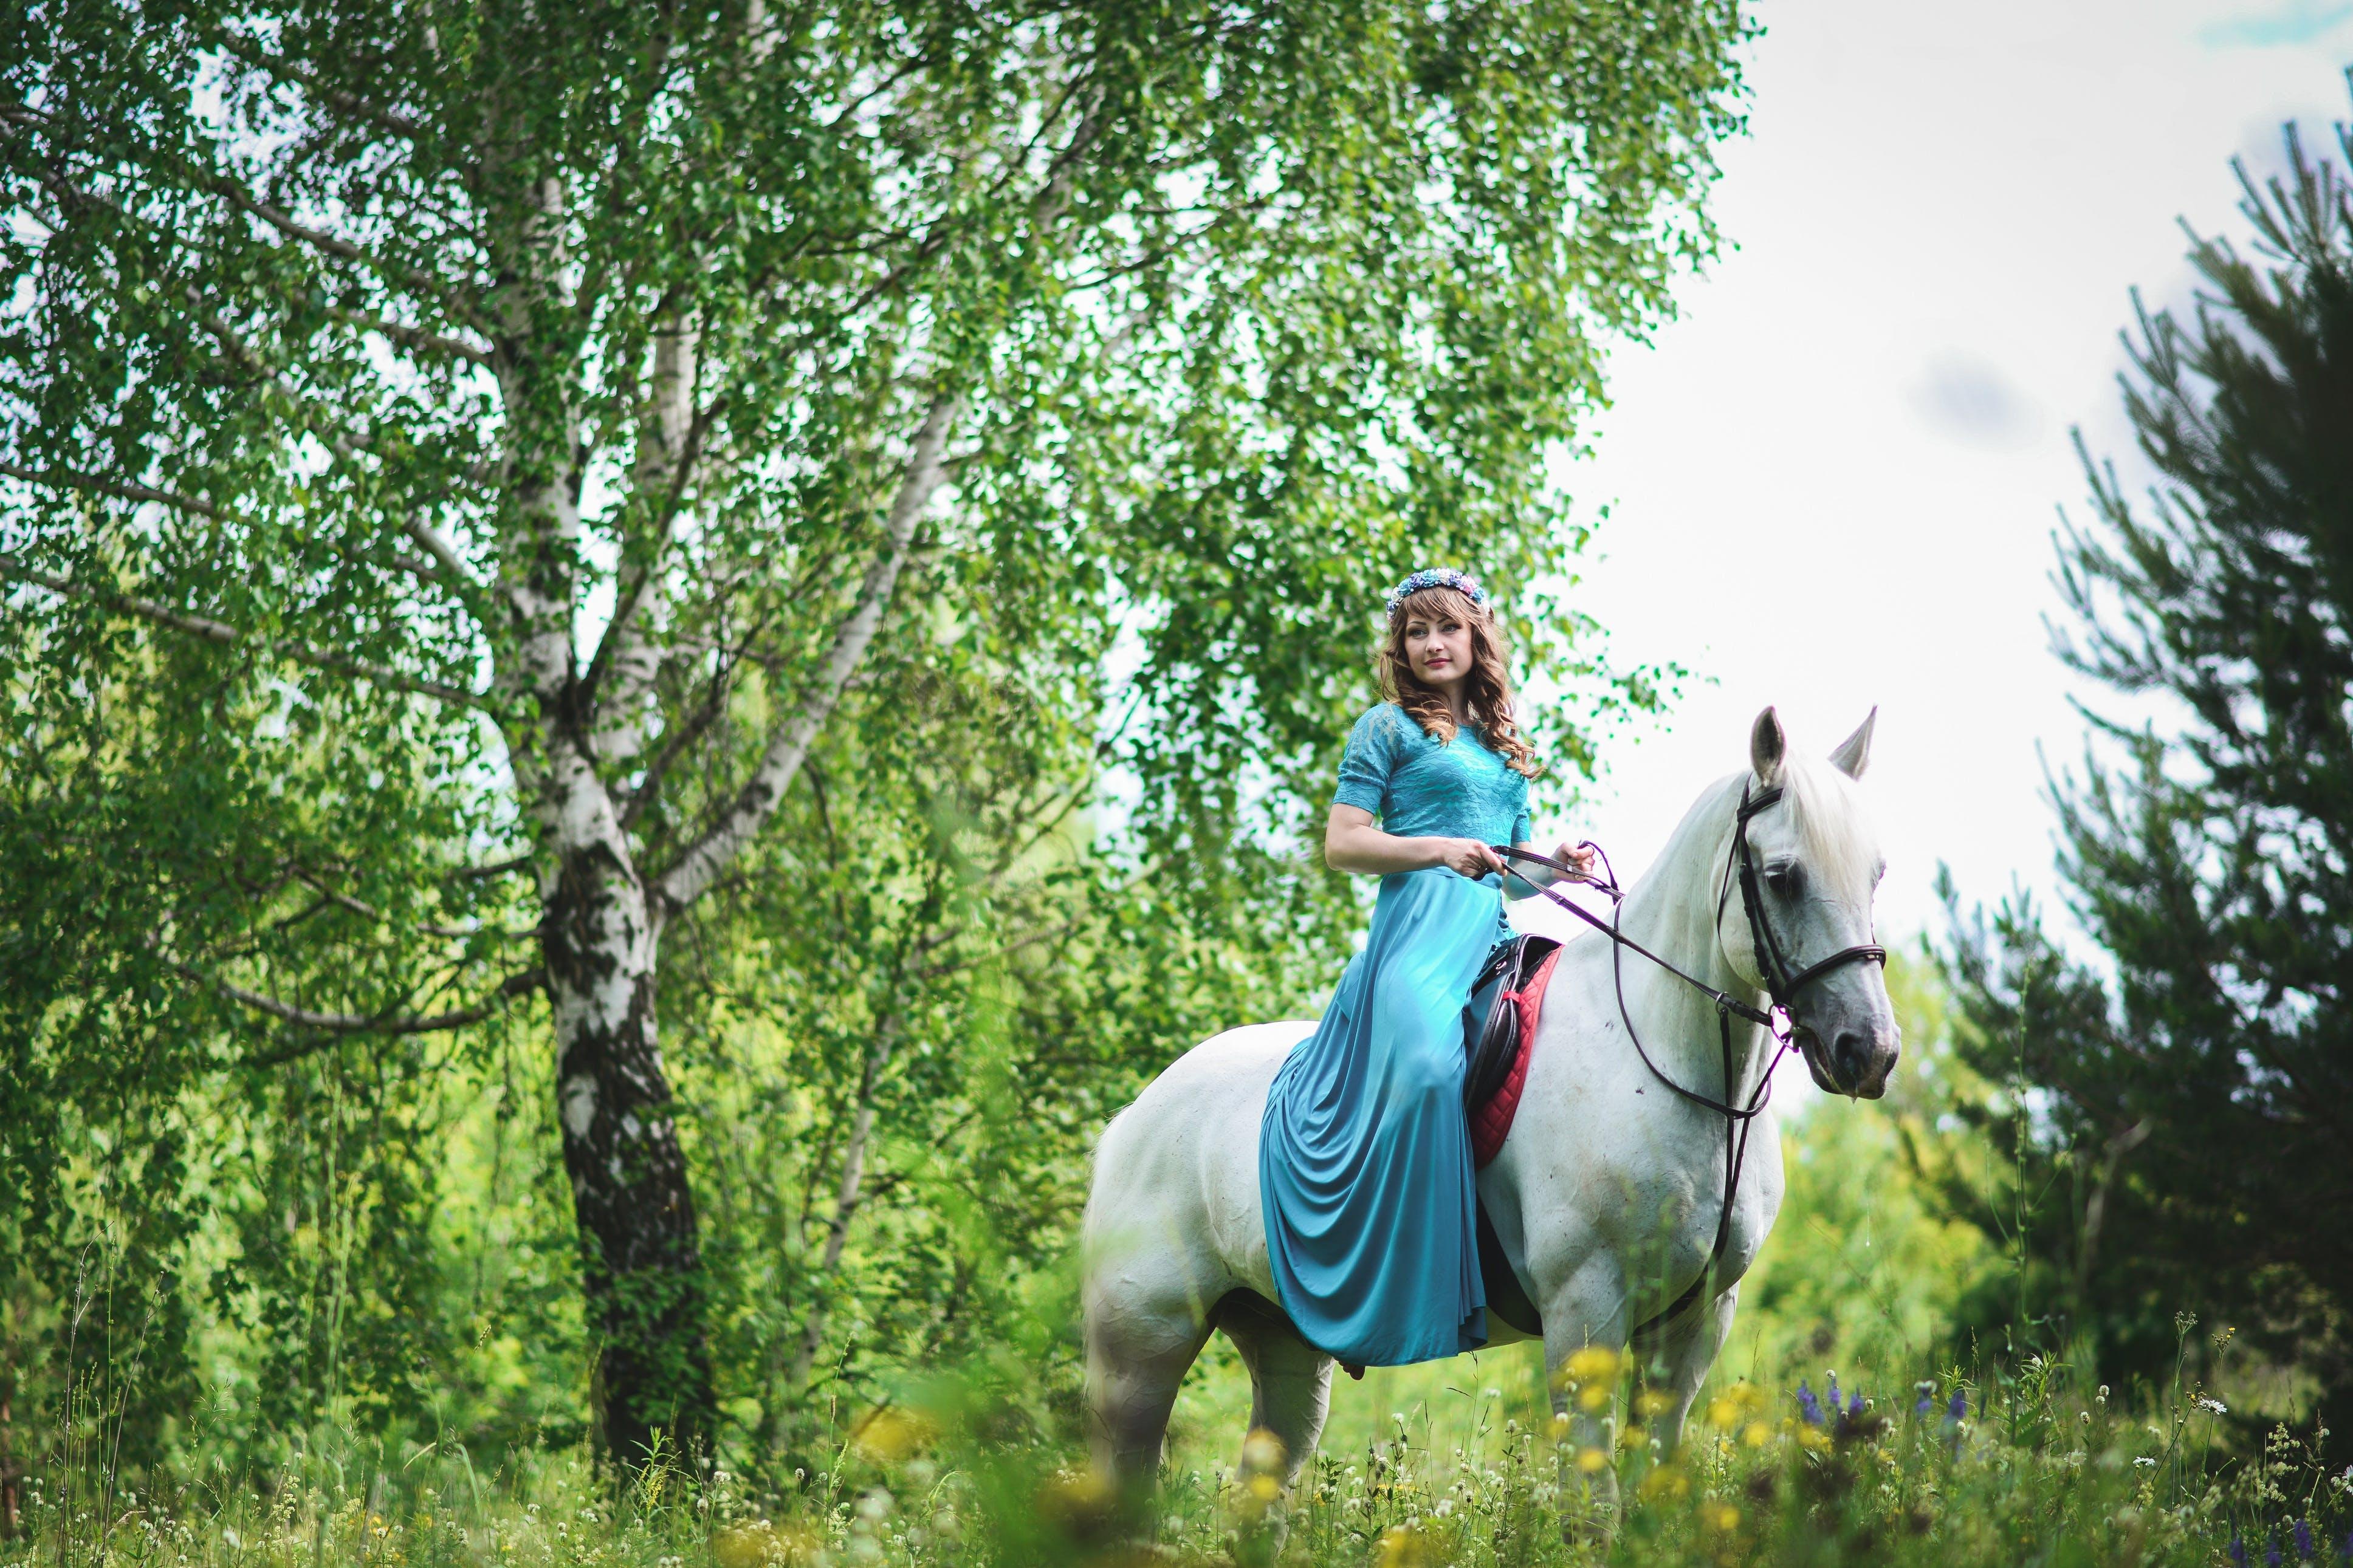 ağaç, at, çim, doğa içeren Ücretsiz stok fotoğraf